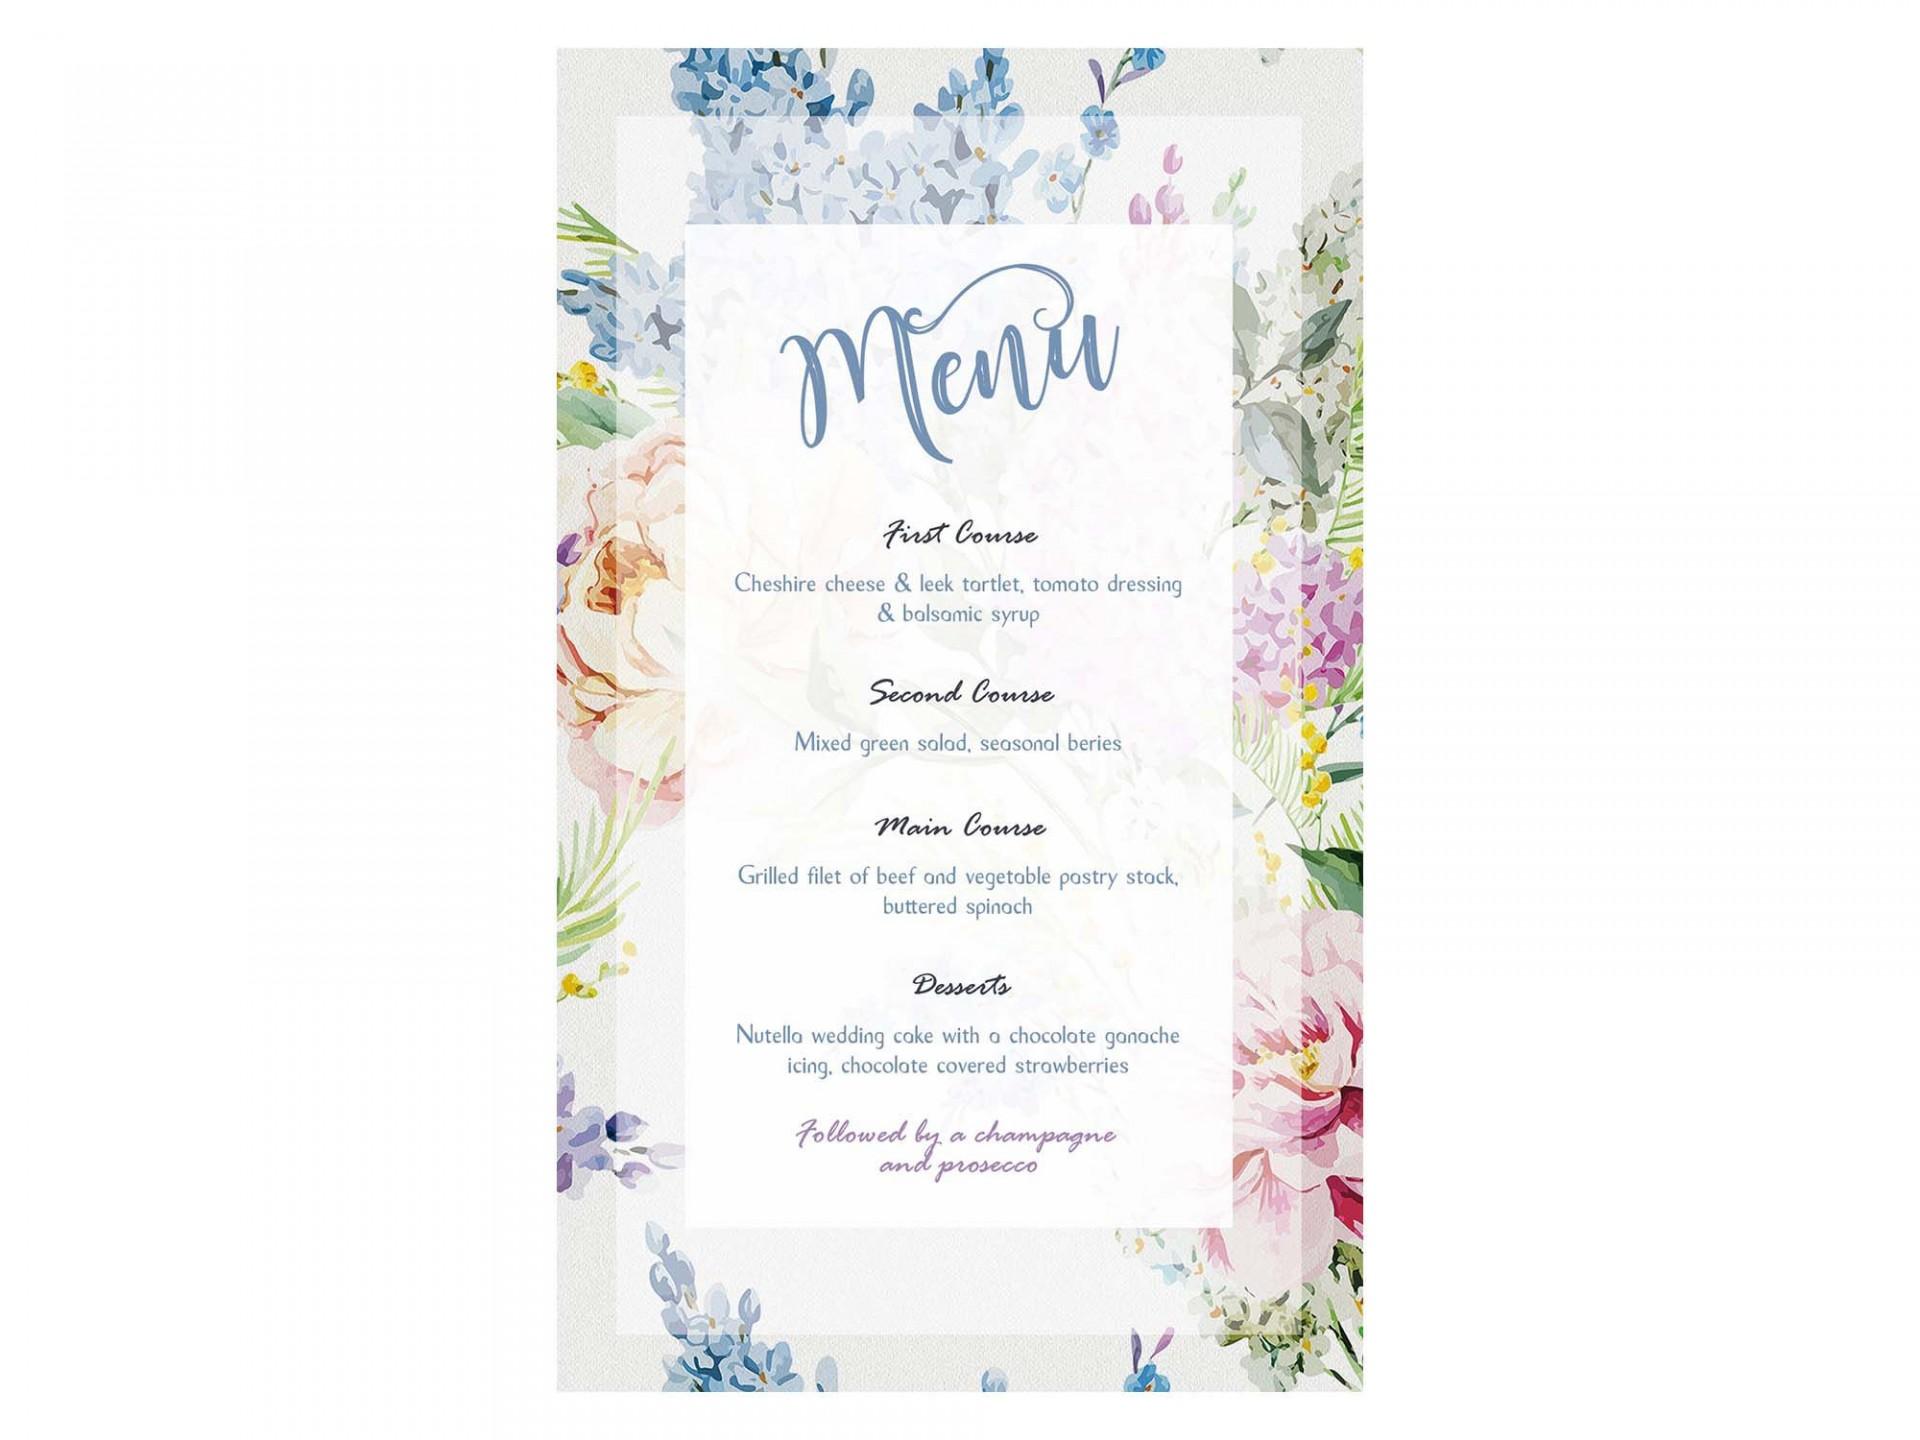 005 Frightening Free Printable Wedding Menu Card Template Example  Templates1920